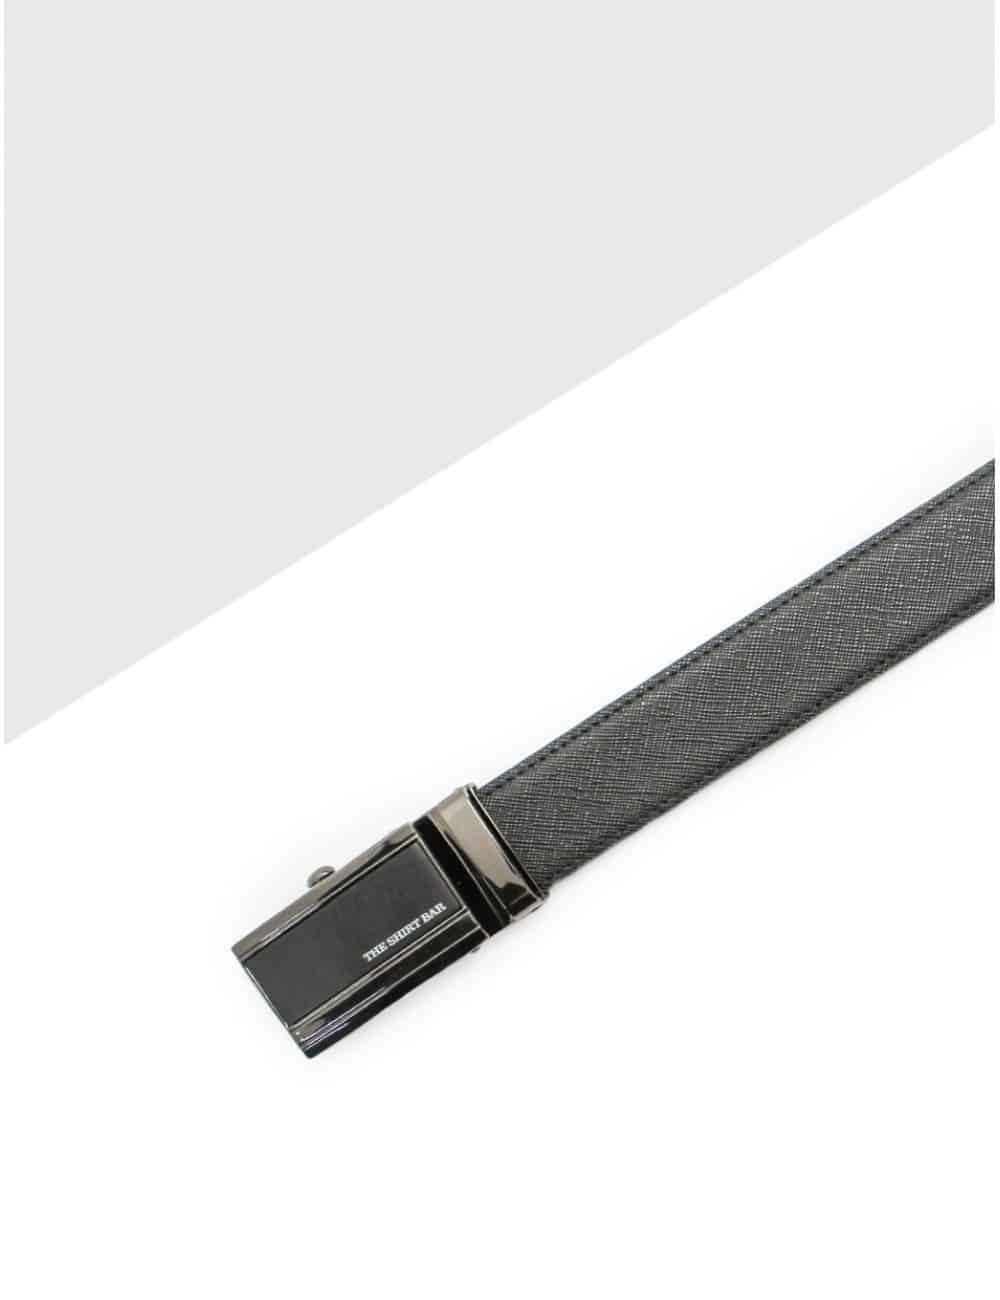 Black Textured Auto Lock Leather Belt LBA20.5